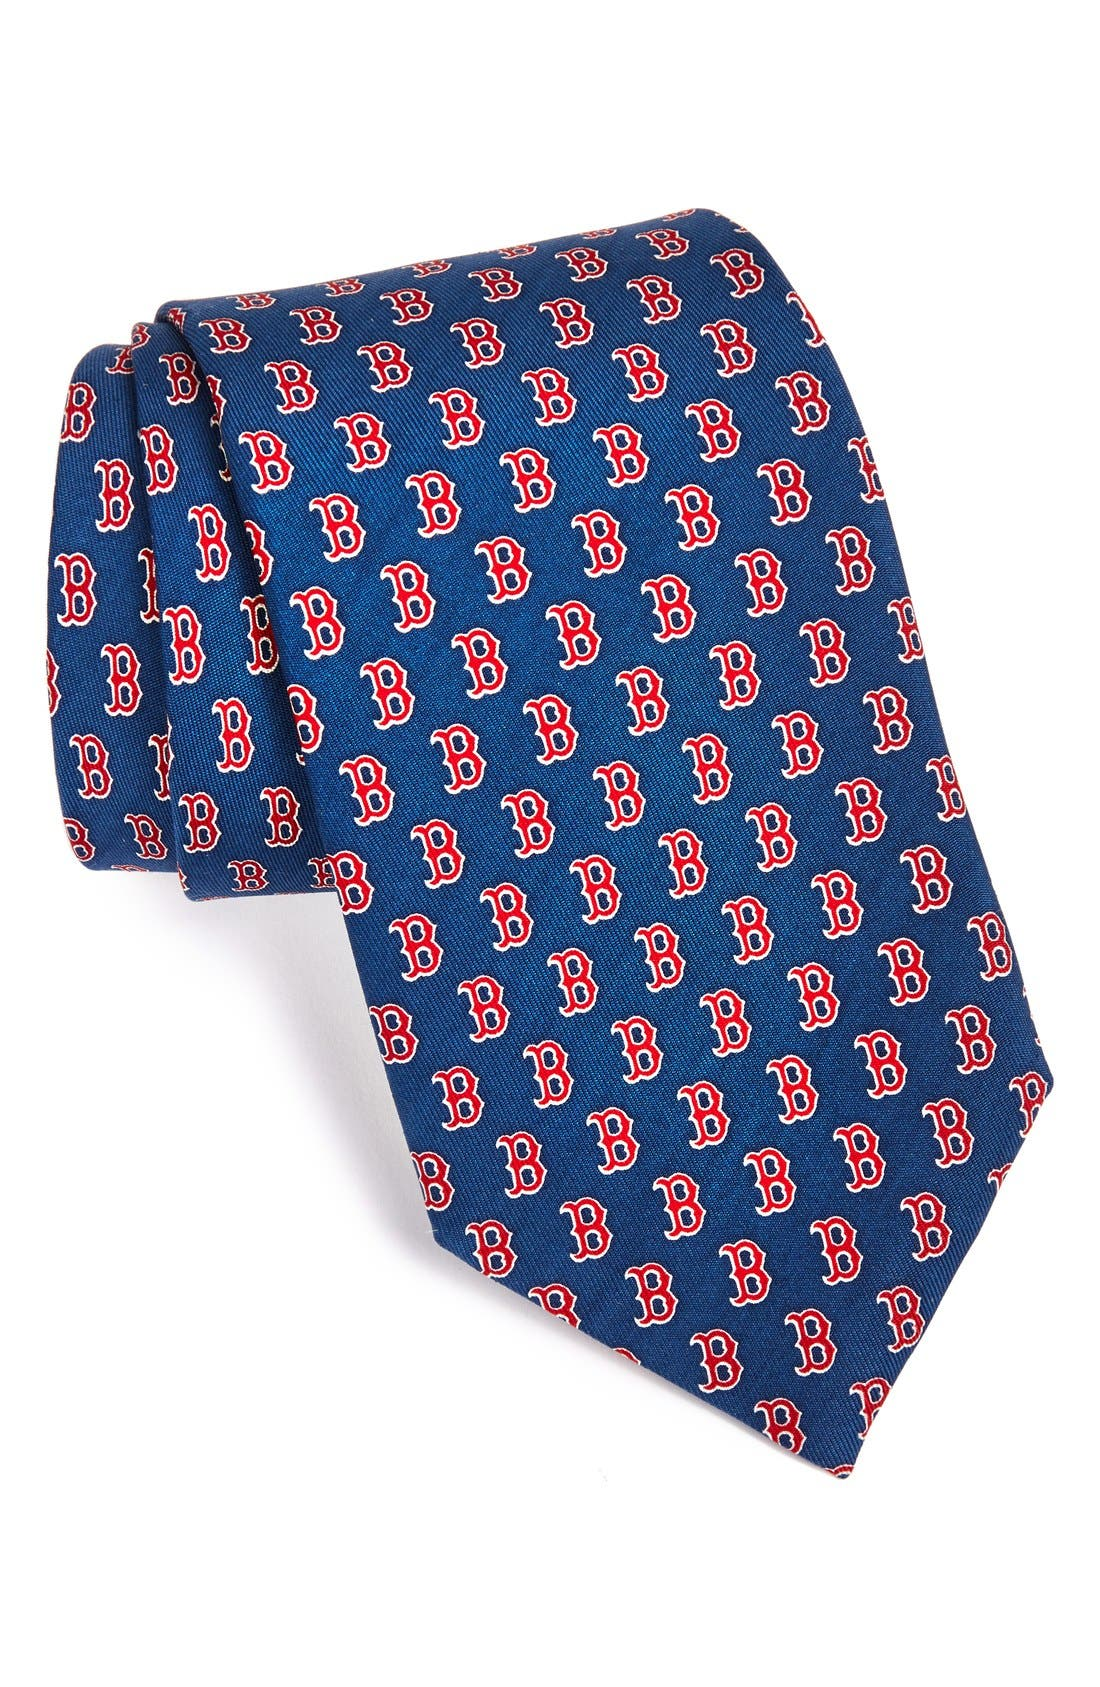 Boston Red Sox Silk Tie,                             Main thumbnail 1, color,                             414